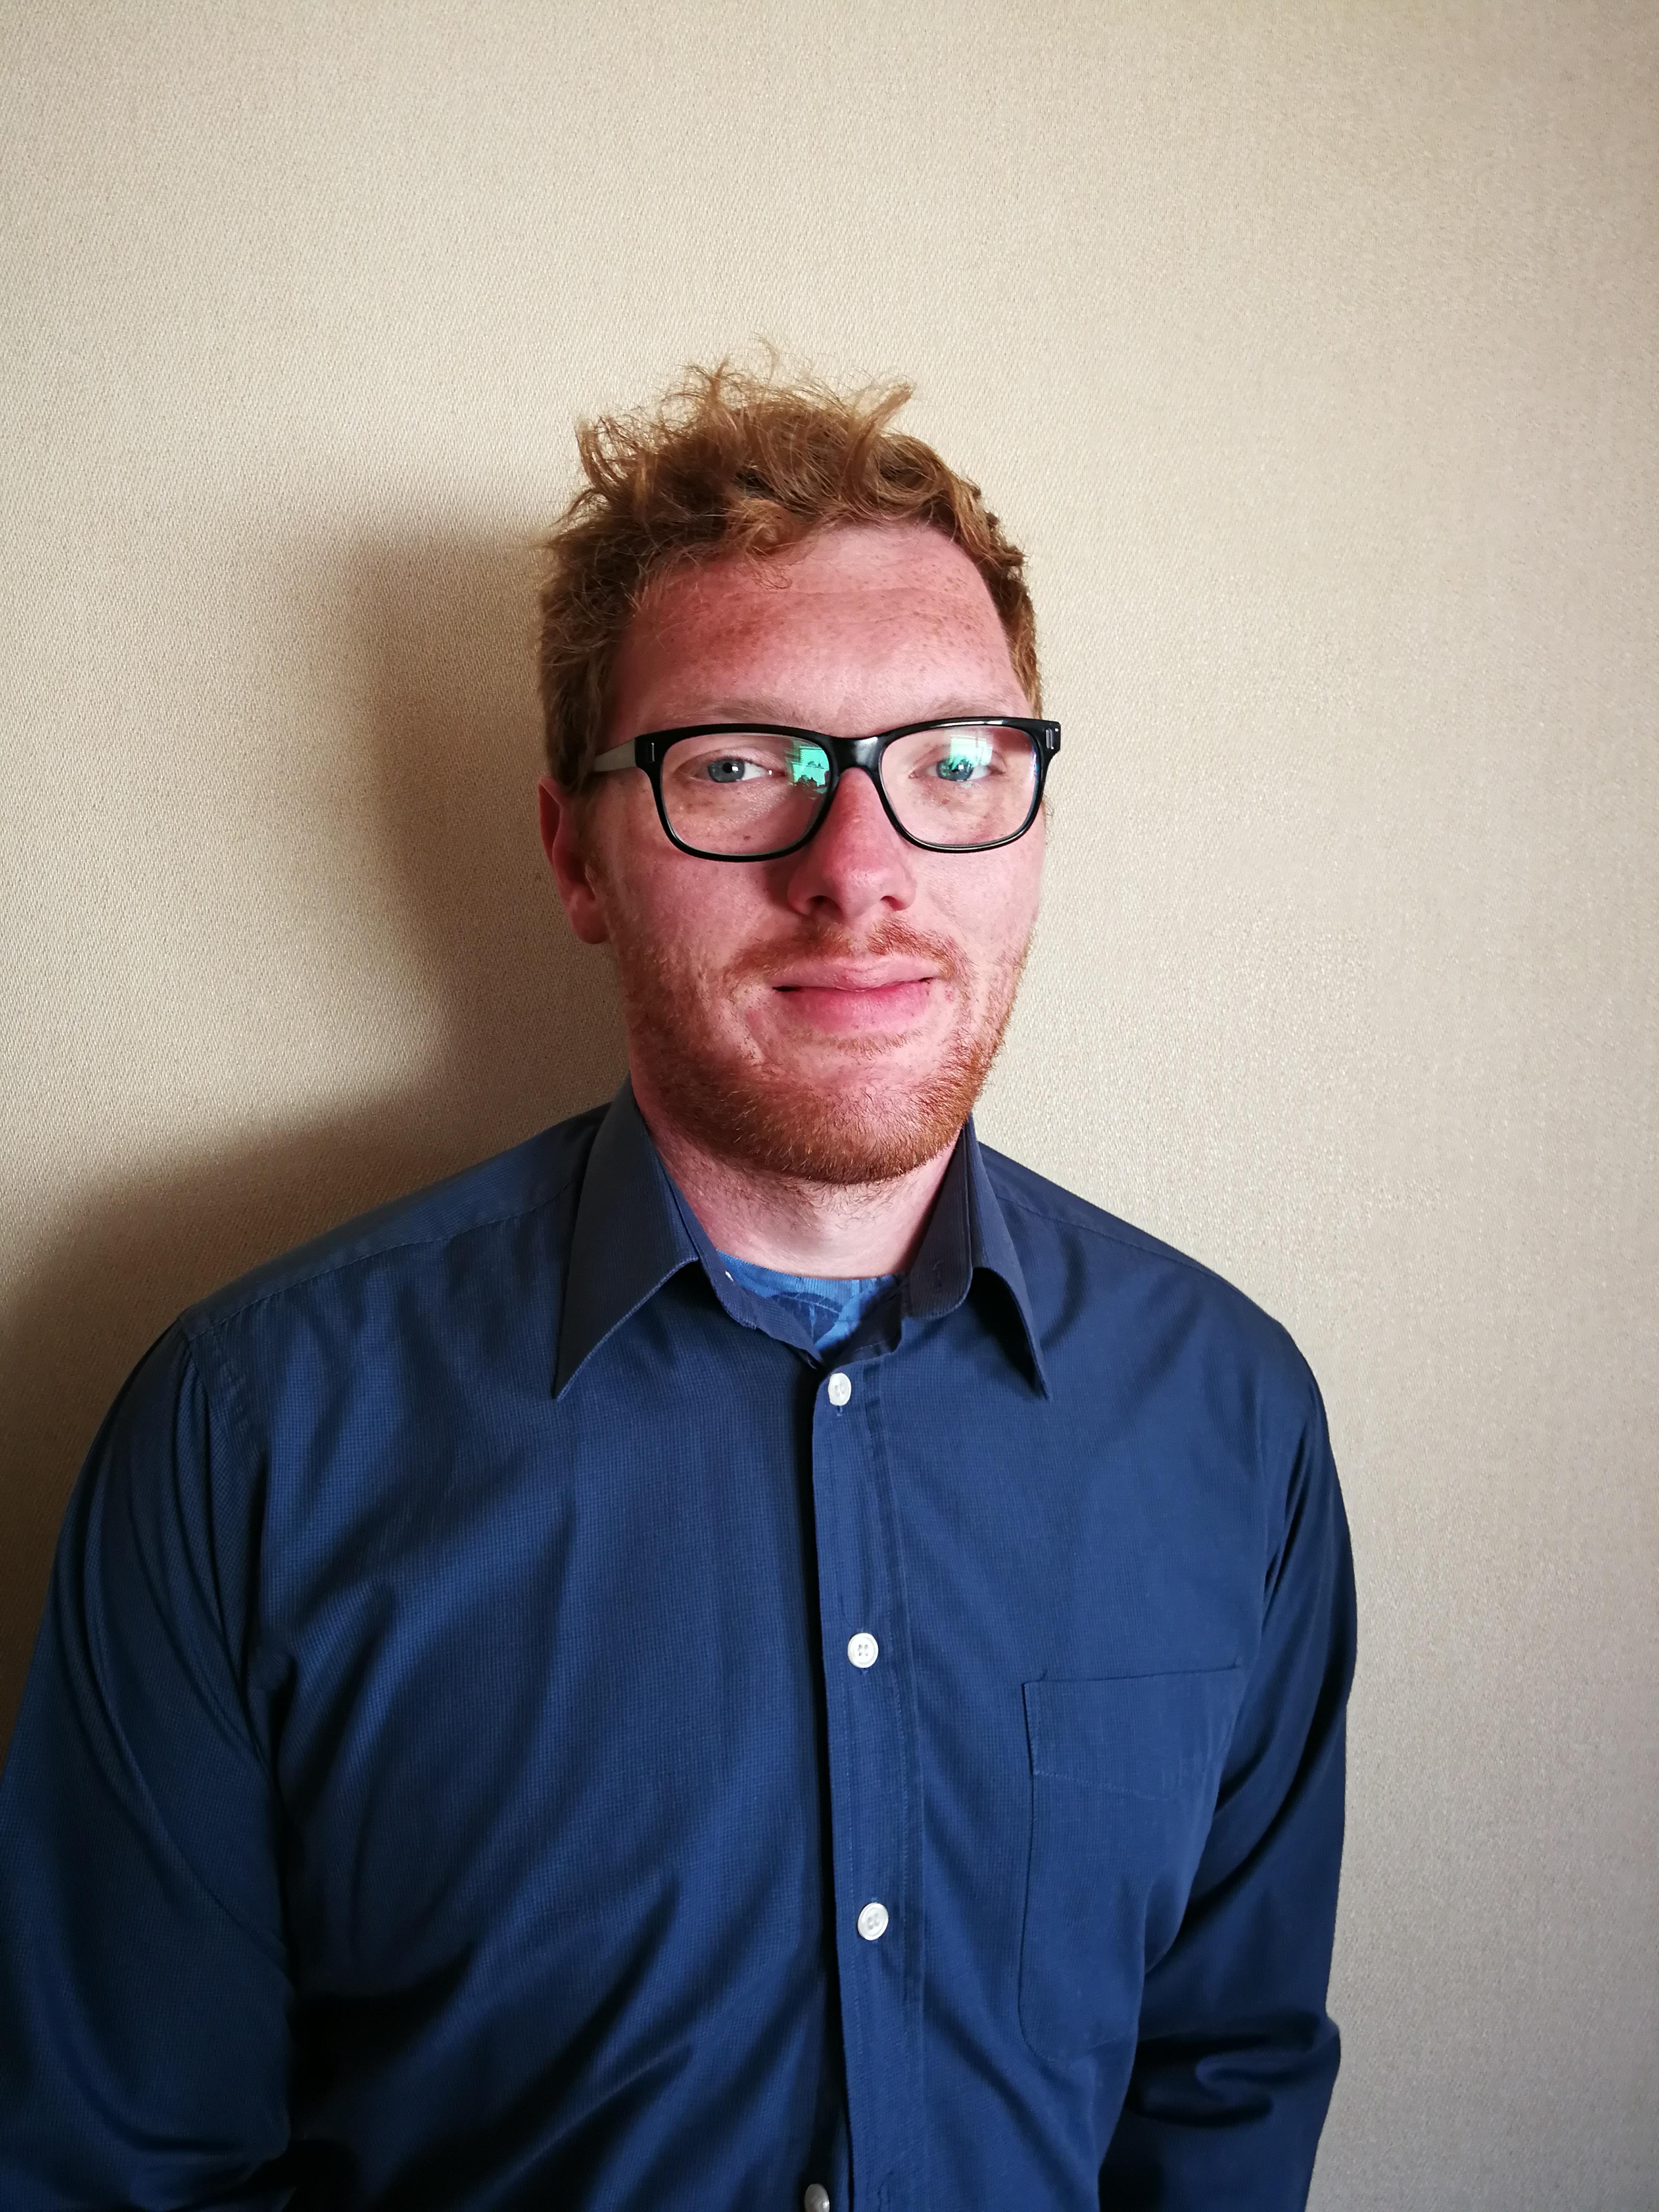 Photo of the lighting designer Kyle Best